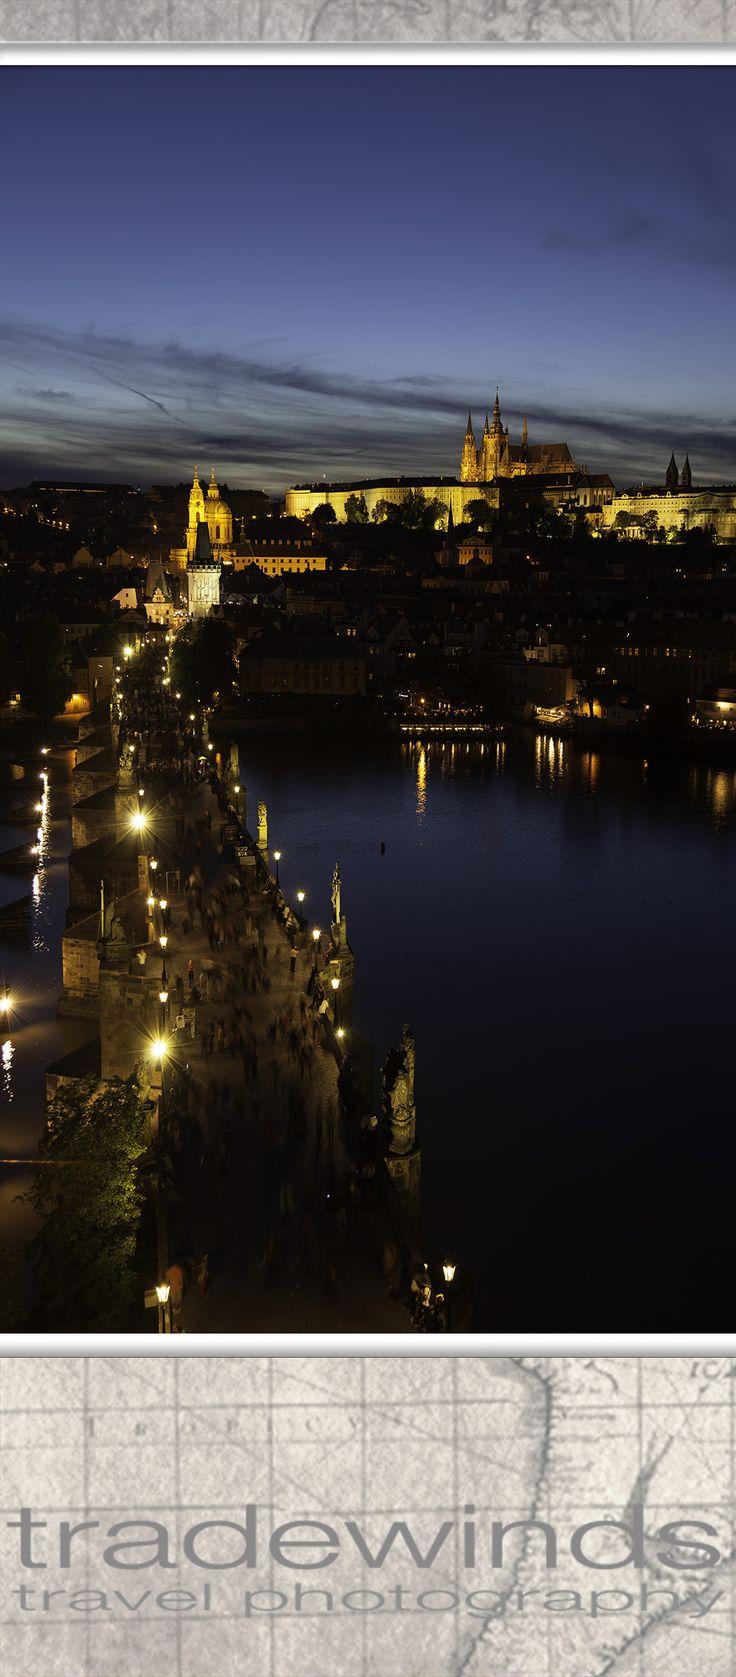 Charles Bridge (Karluv most) and Prague castle Vysehrad at night; Czech Republic